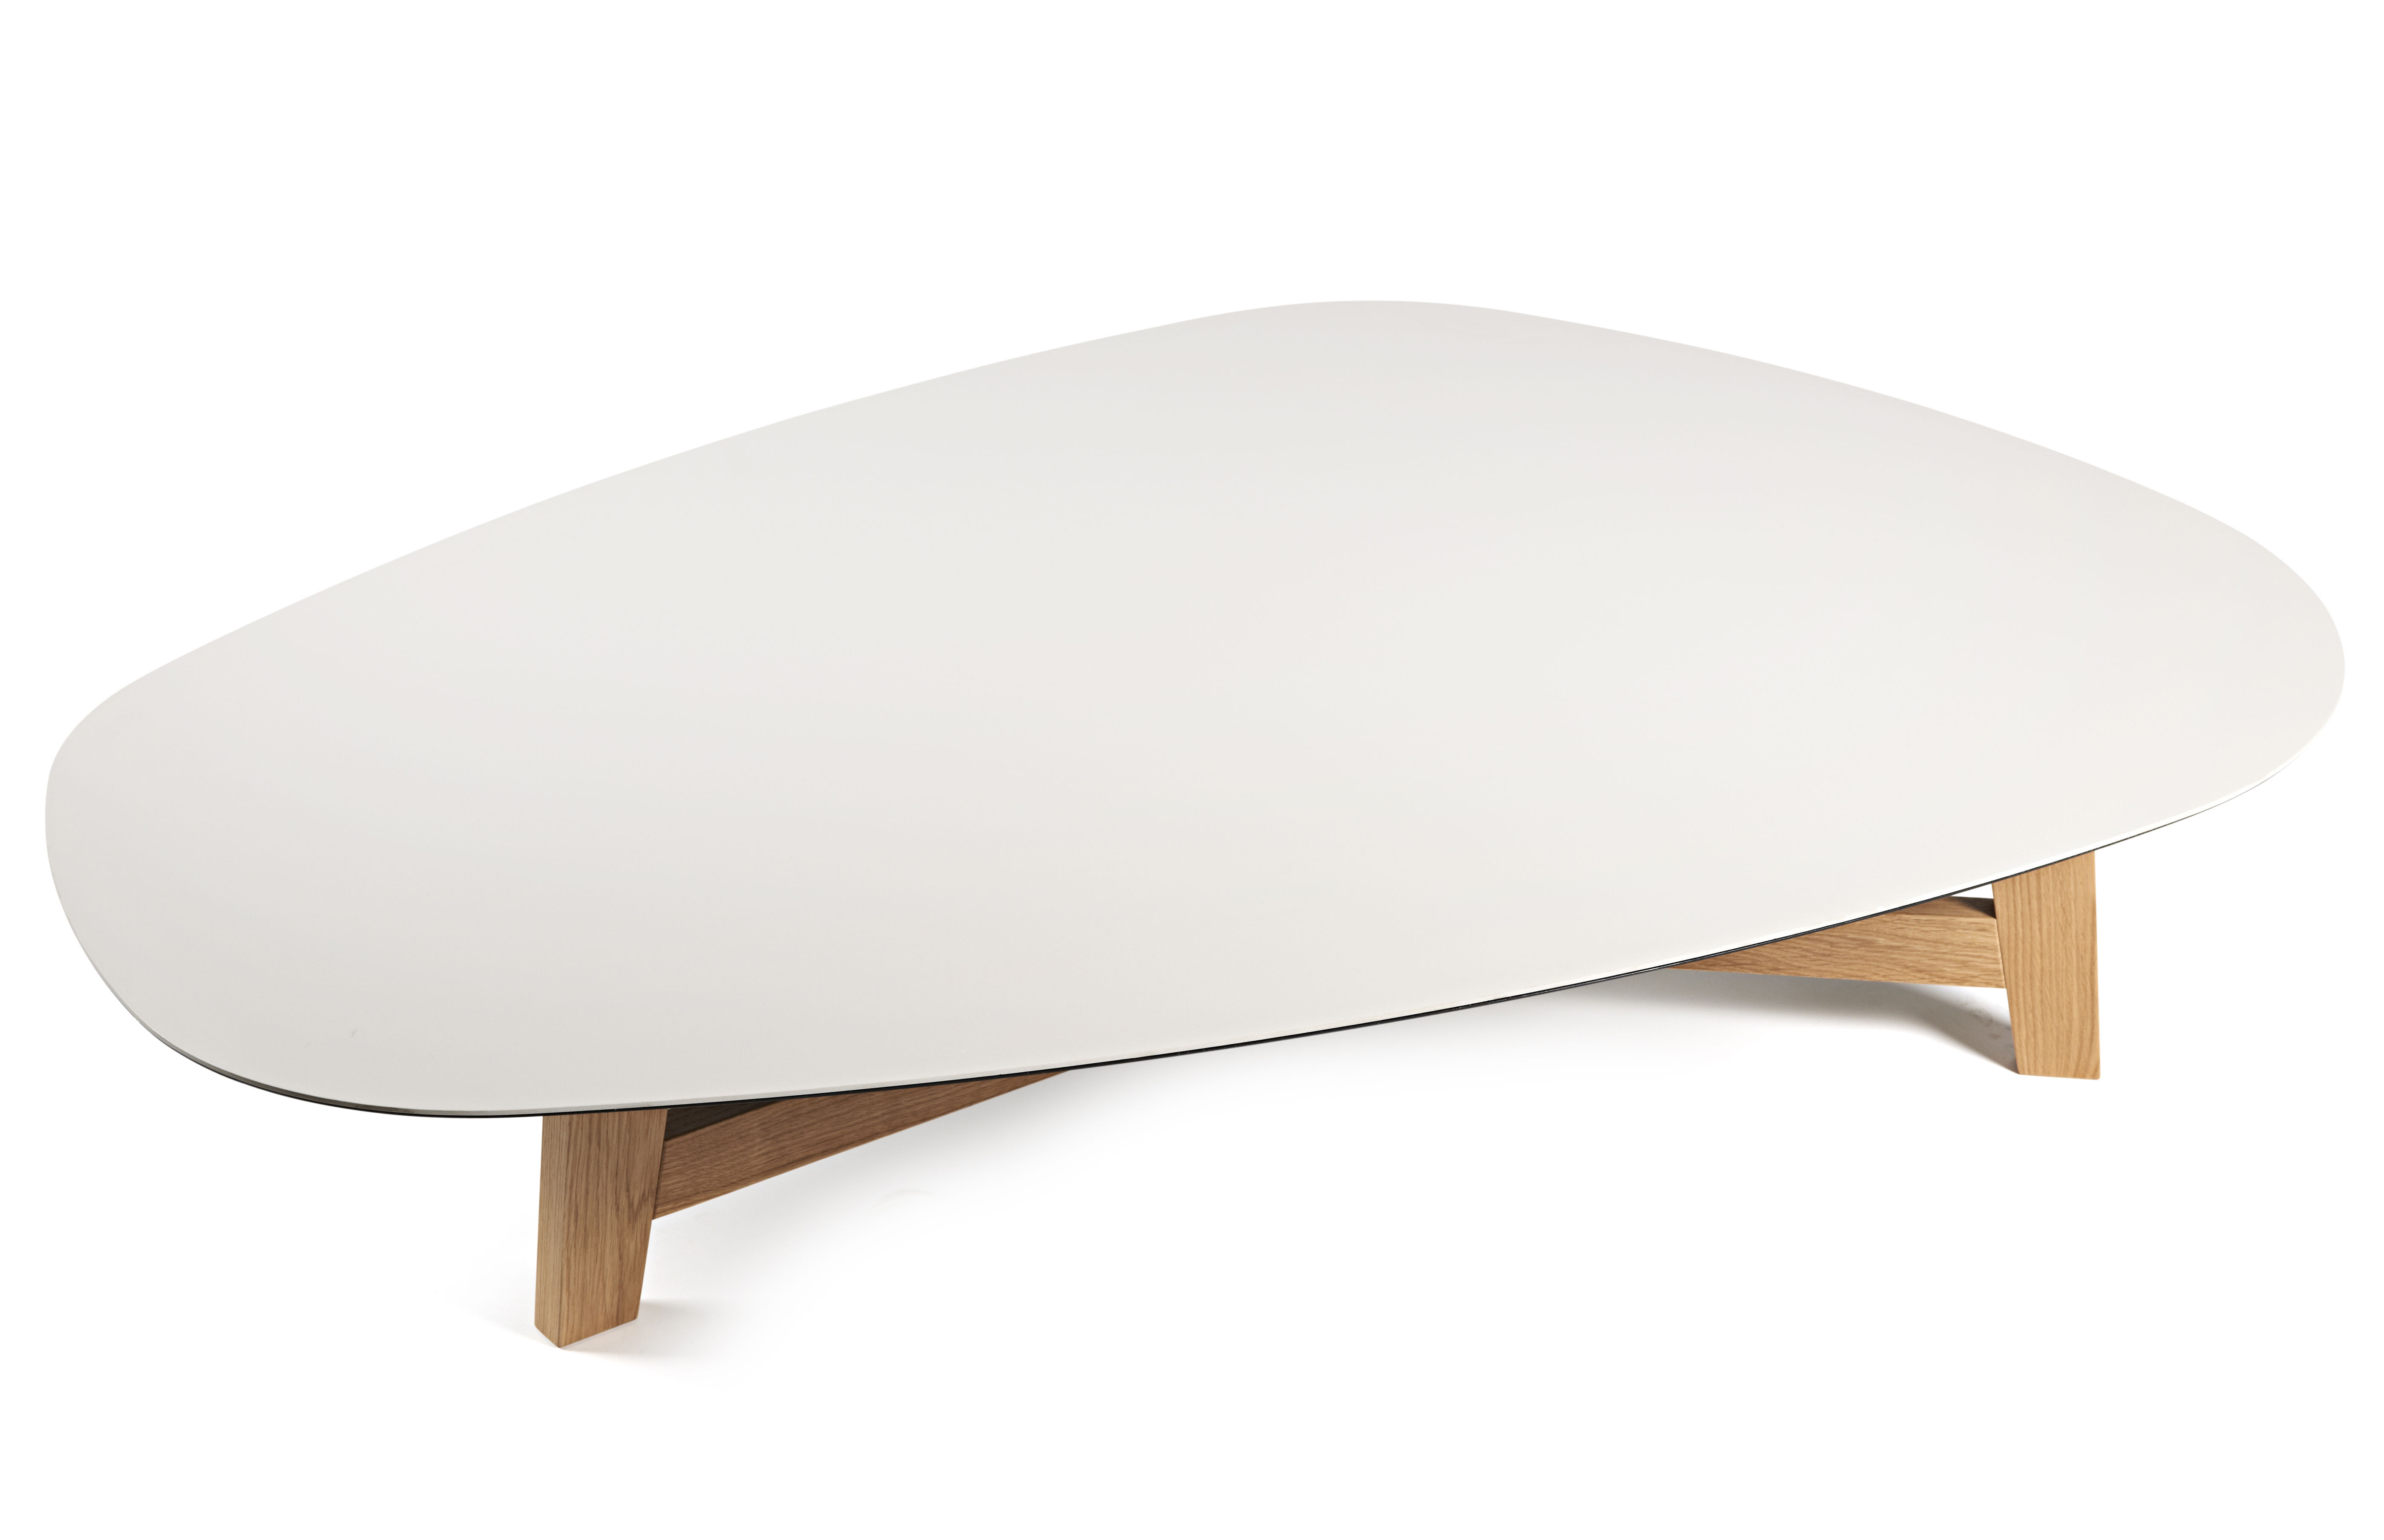 table basse t phoenix grand plateau pied ch ne plateau. Black Bedroom Furniture Sets. Home Design Ideas